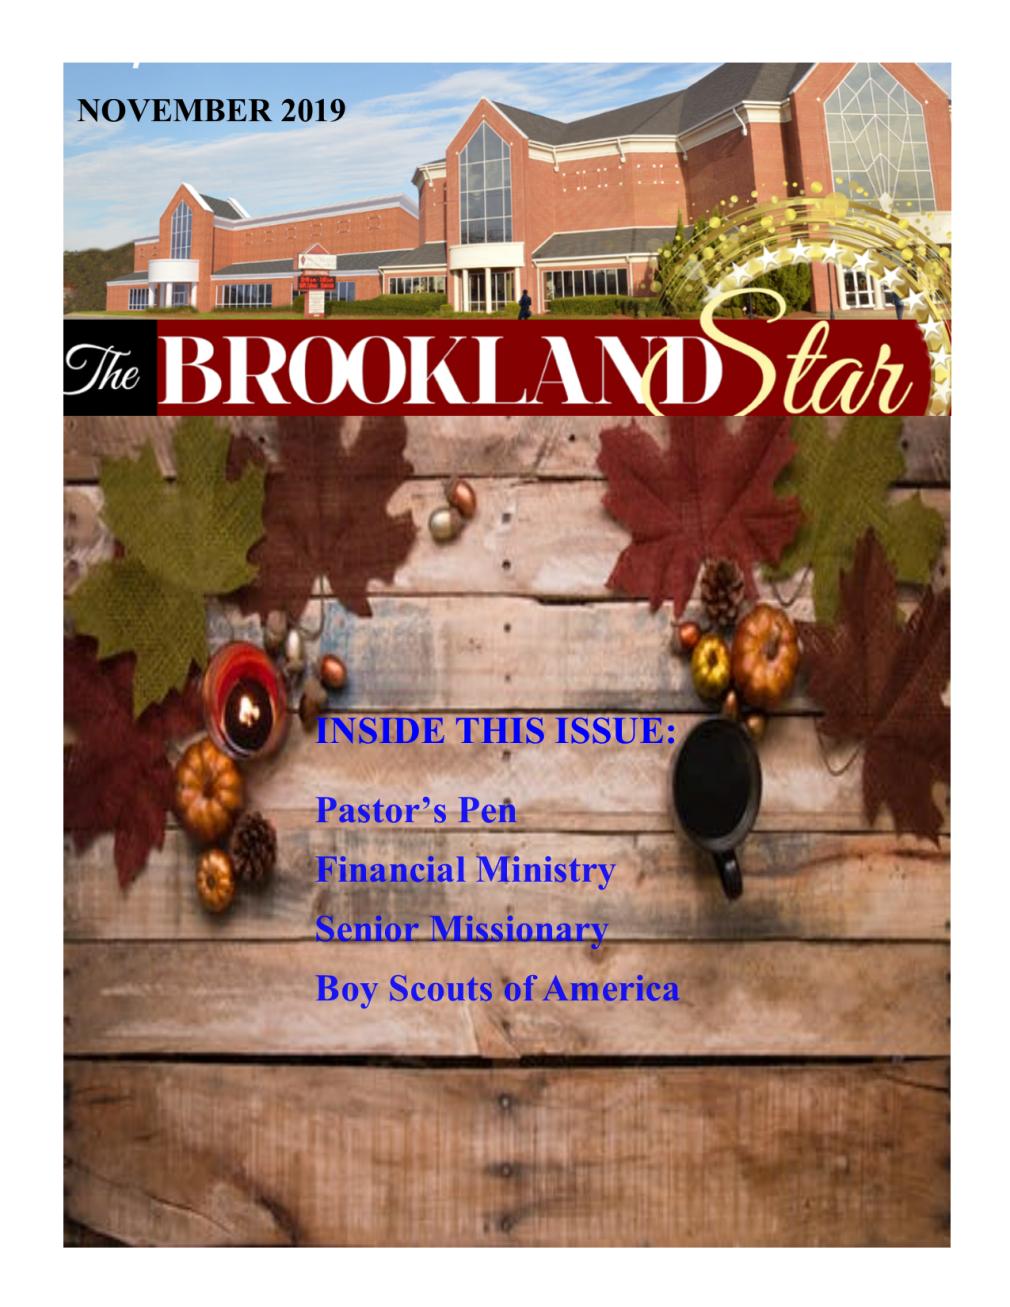 The Brookland Star November 2019 Edition